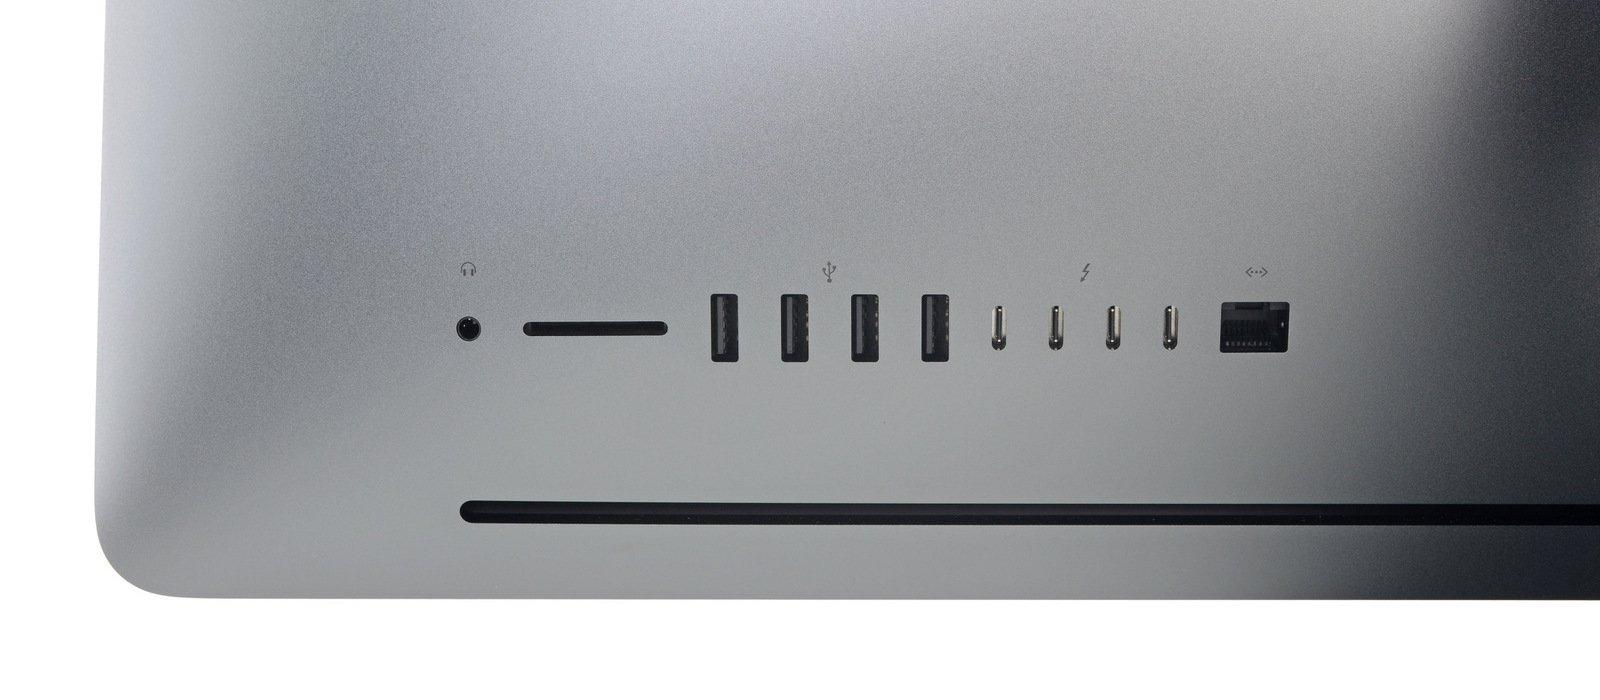 Đang tải Ben_trong_iMac_Pro_3.jpeg…